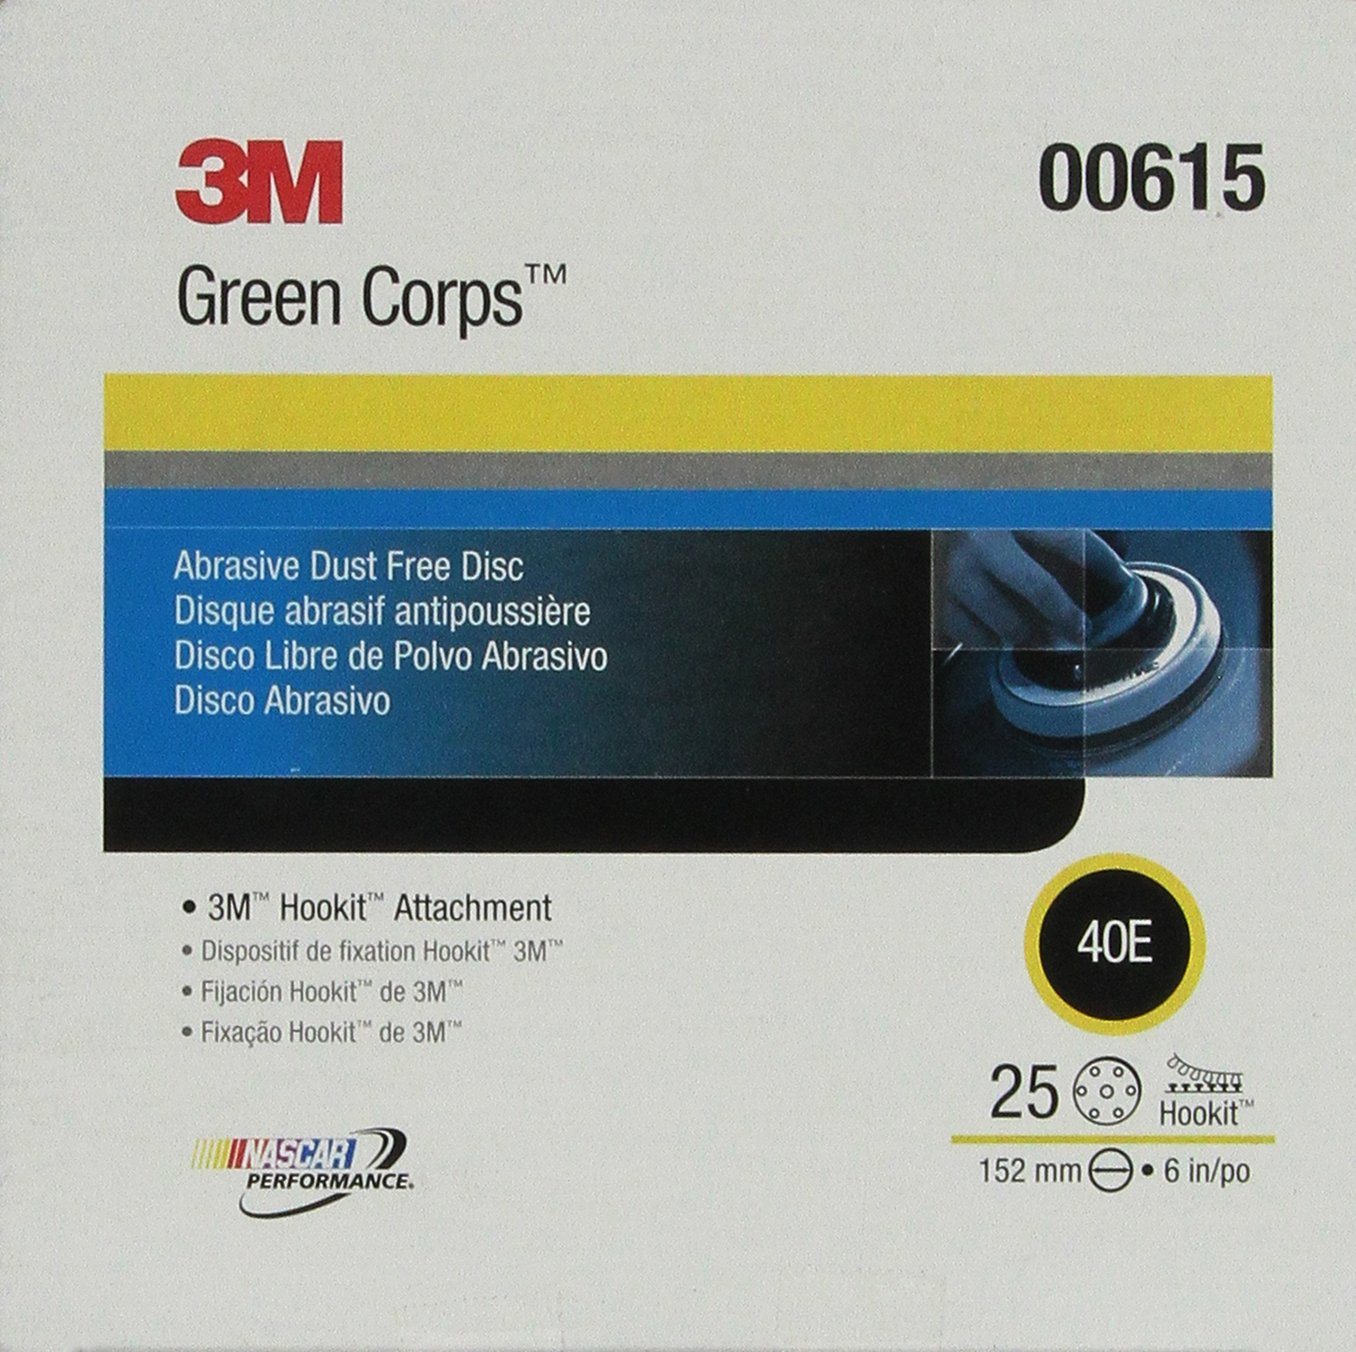 3M 00621 Green Corps Hookit 8' 80E Grit Regalite Dust-Free Disc